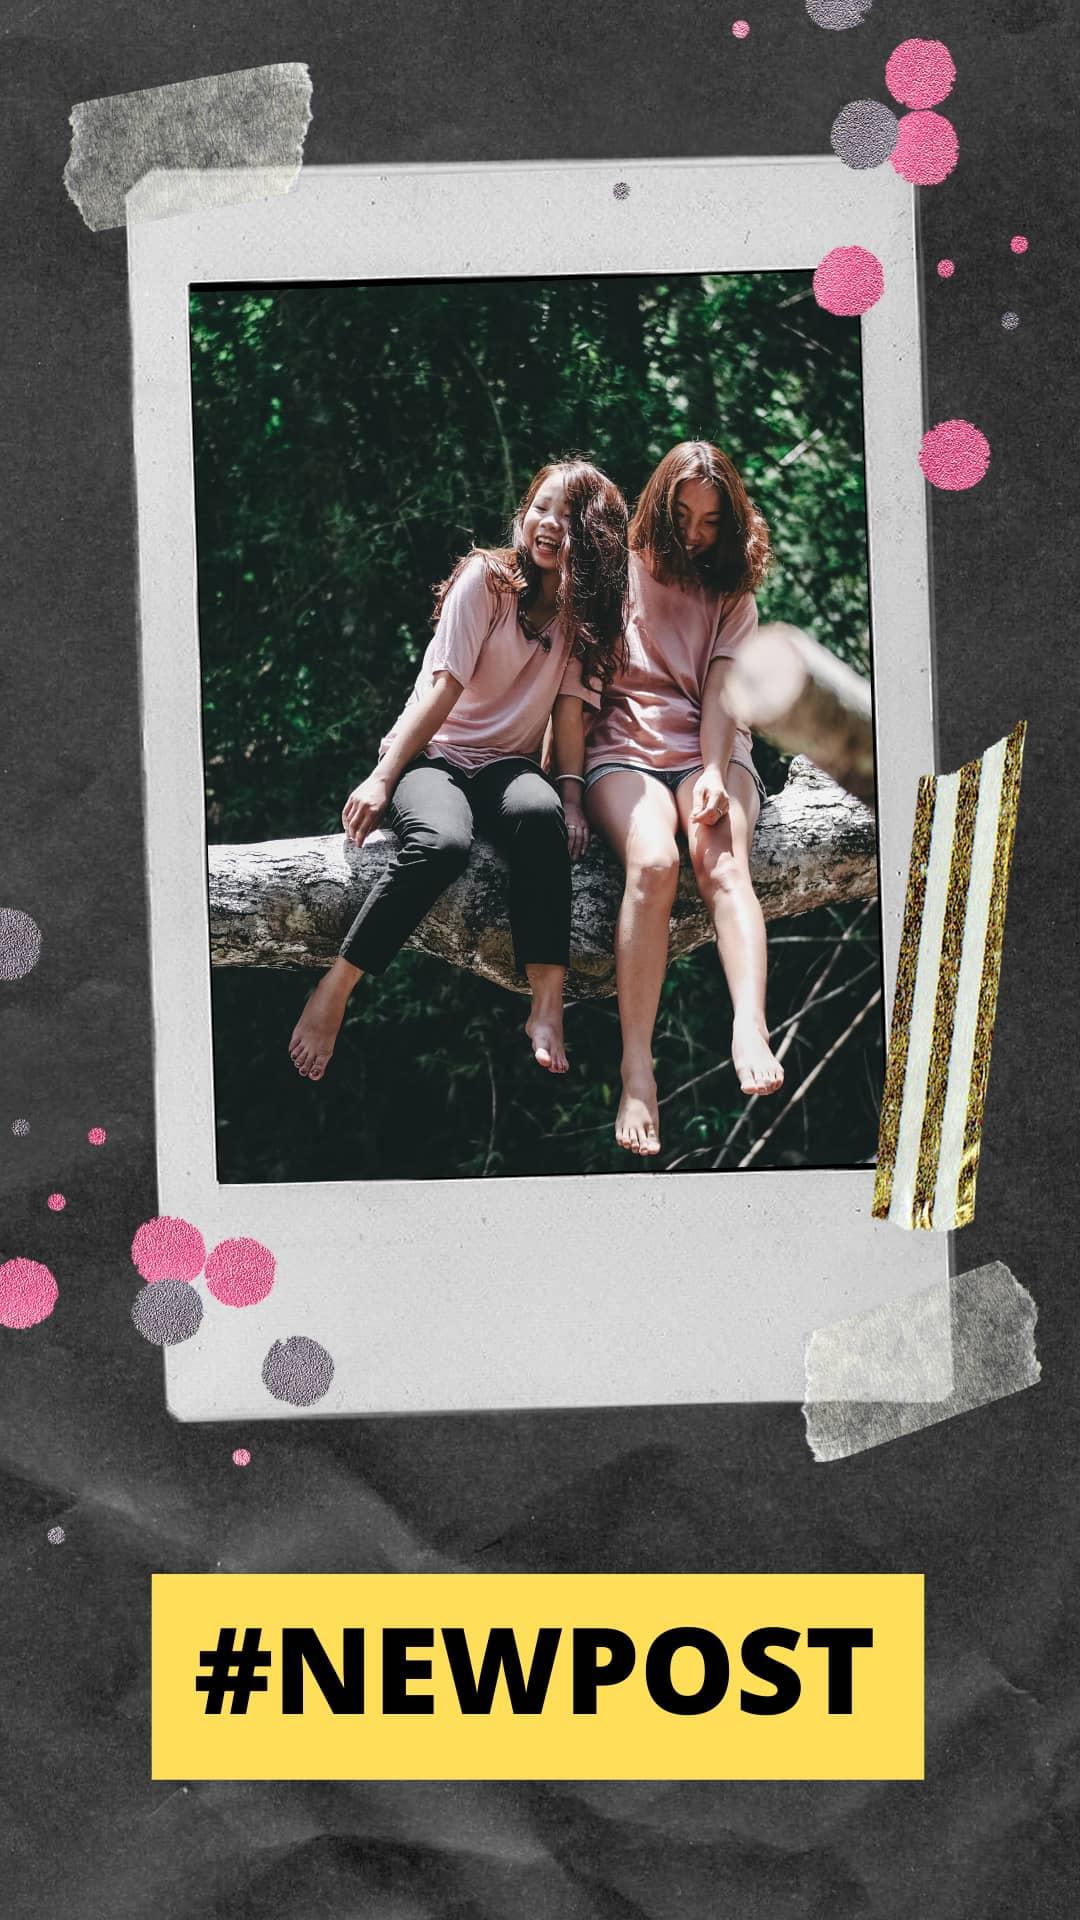 Promote Post on Instagram Stories